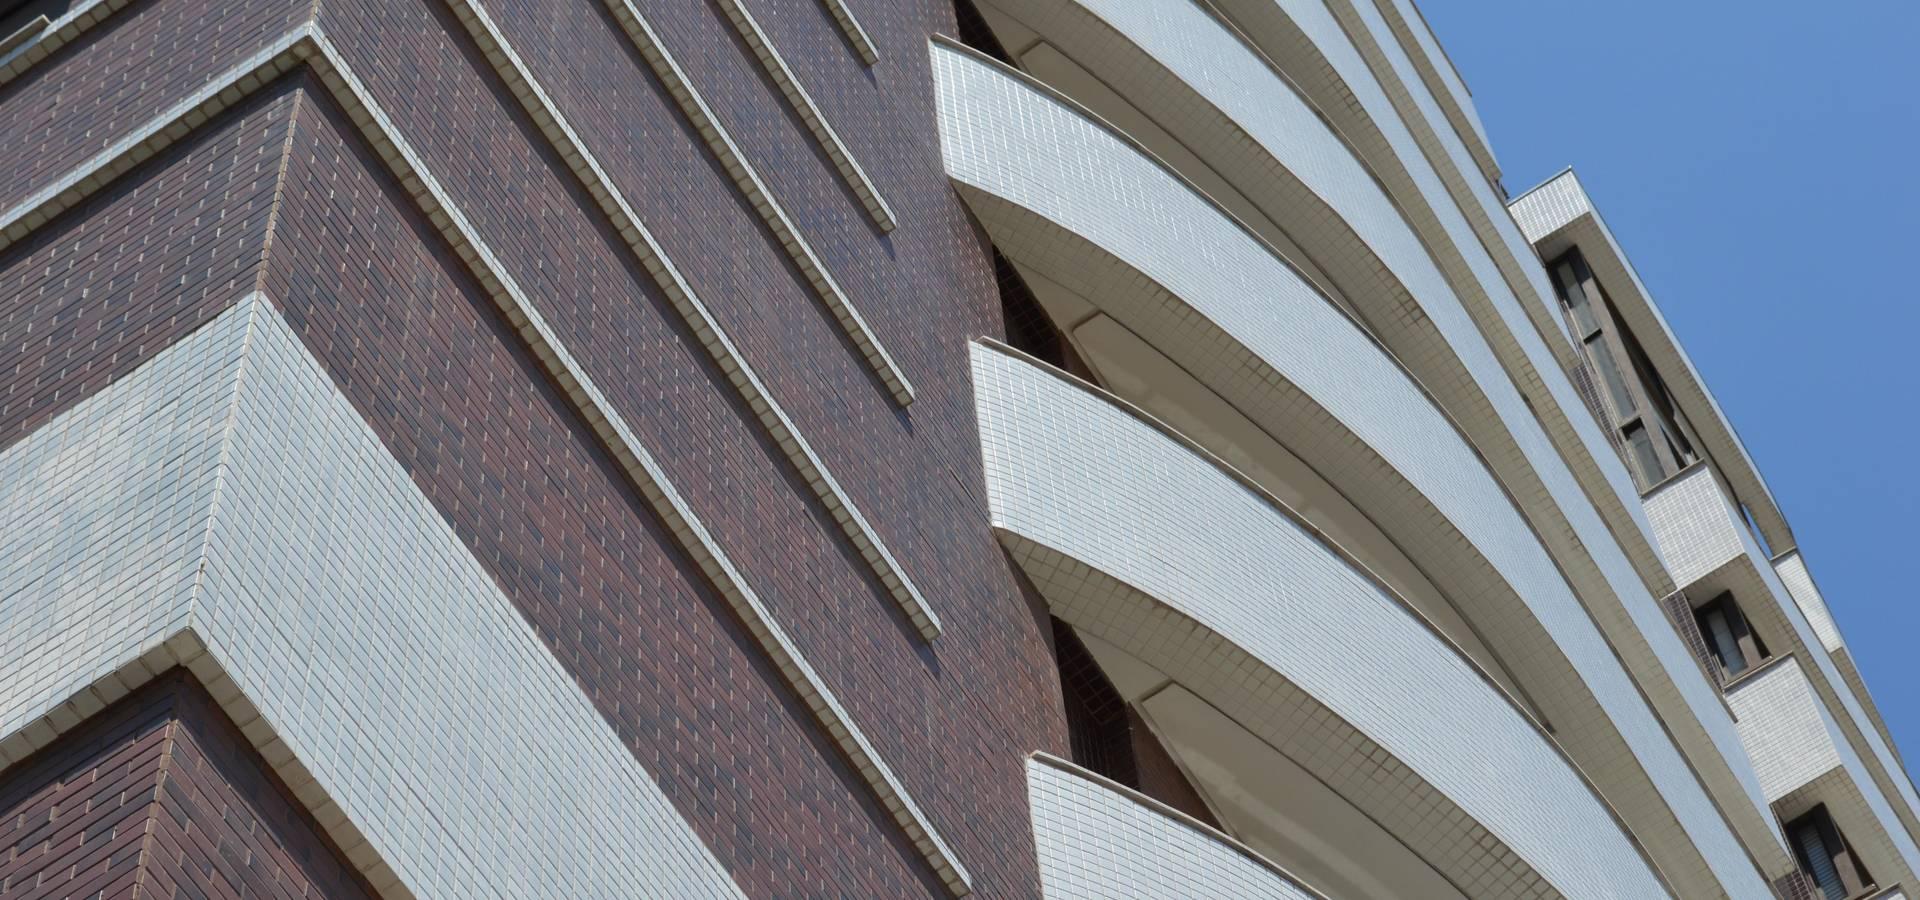 André Petracco Arquitetura